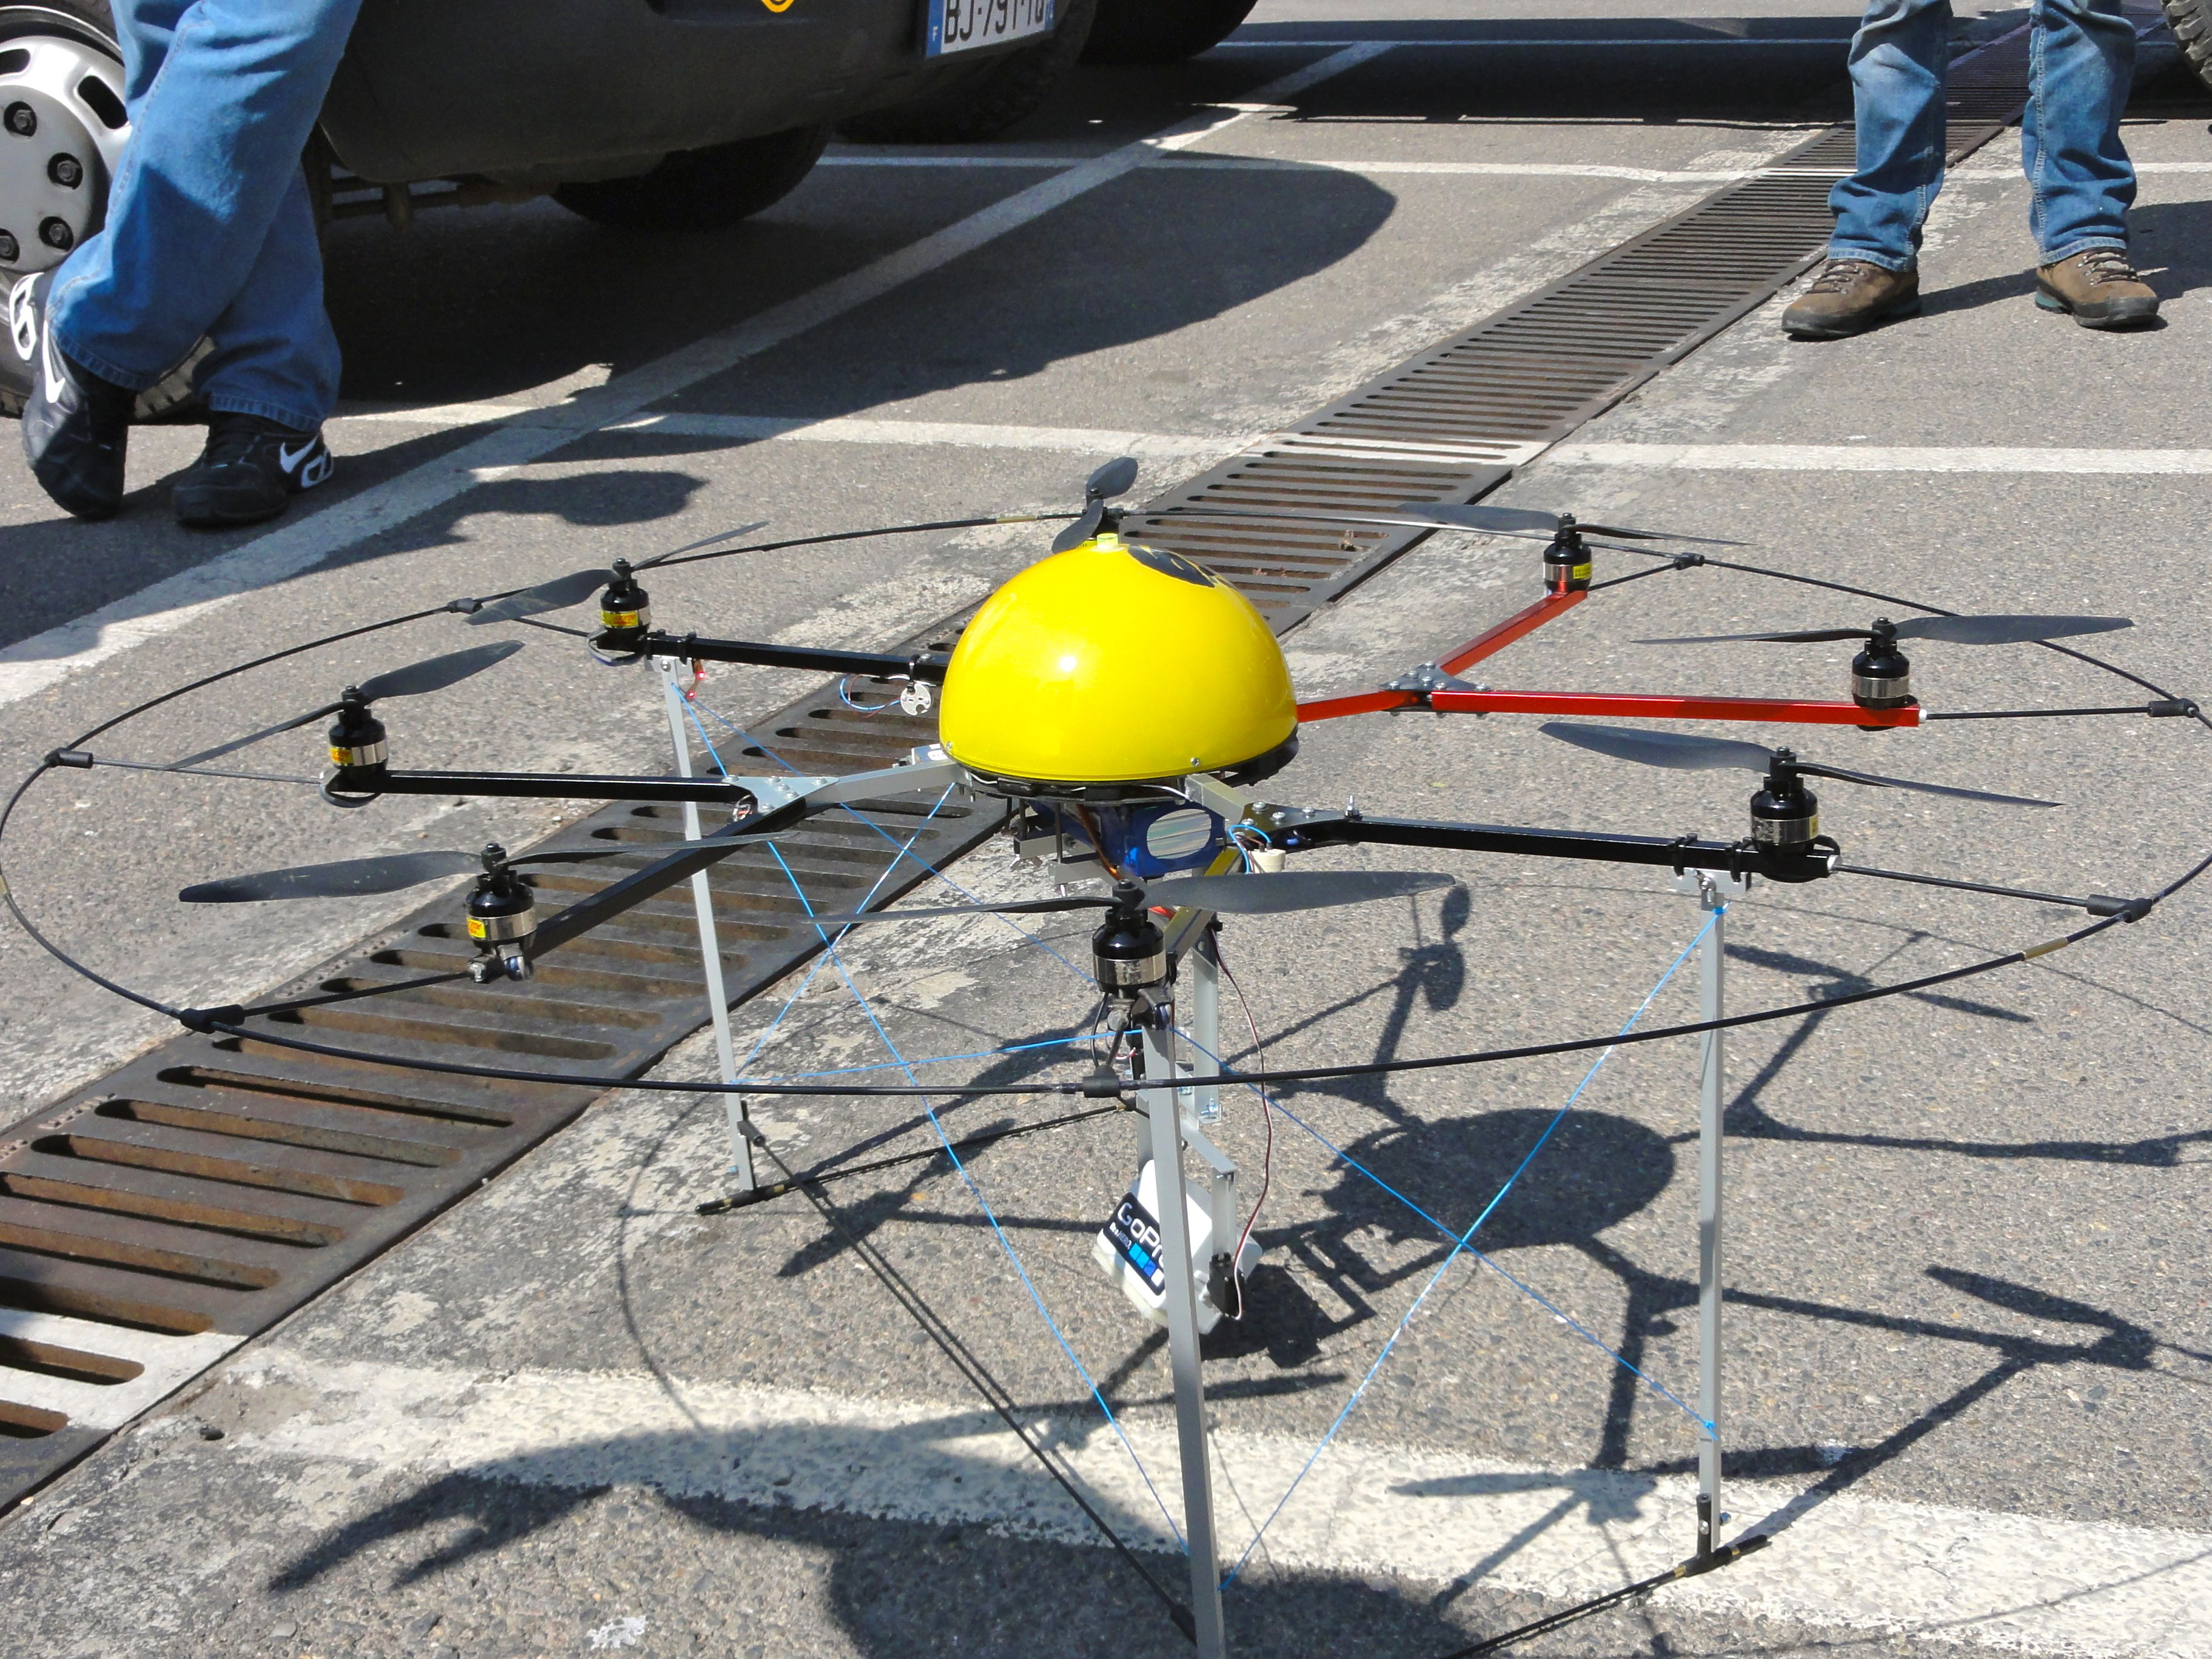 parrot ar drone instructions